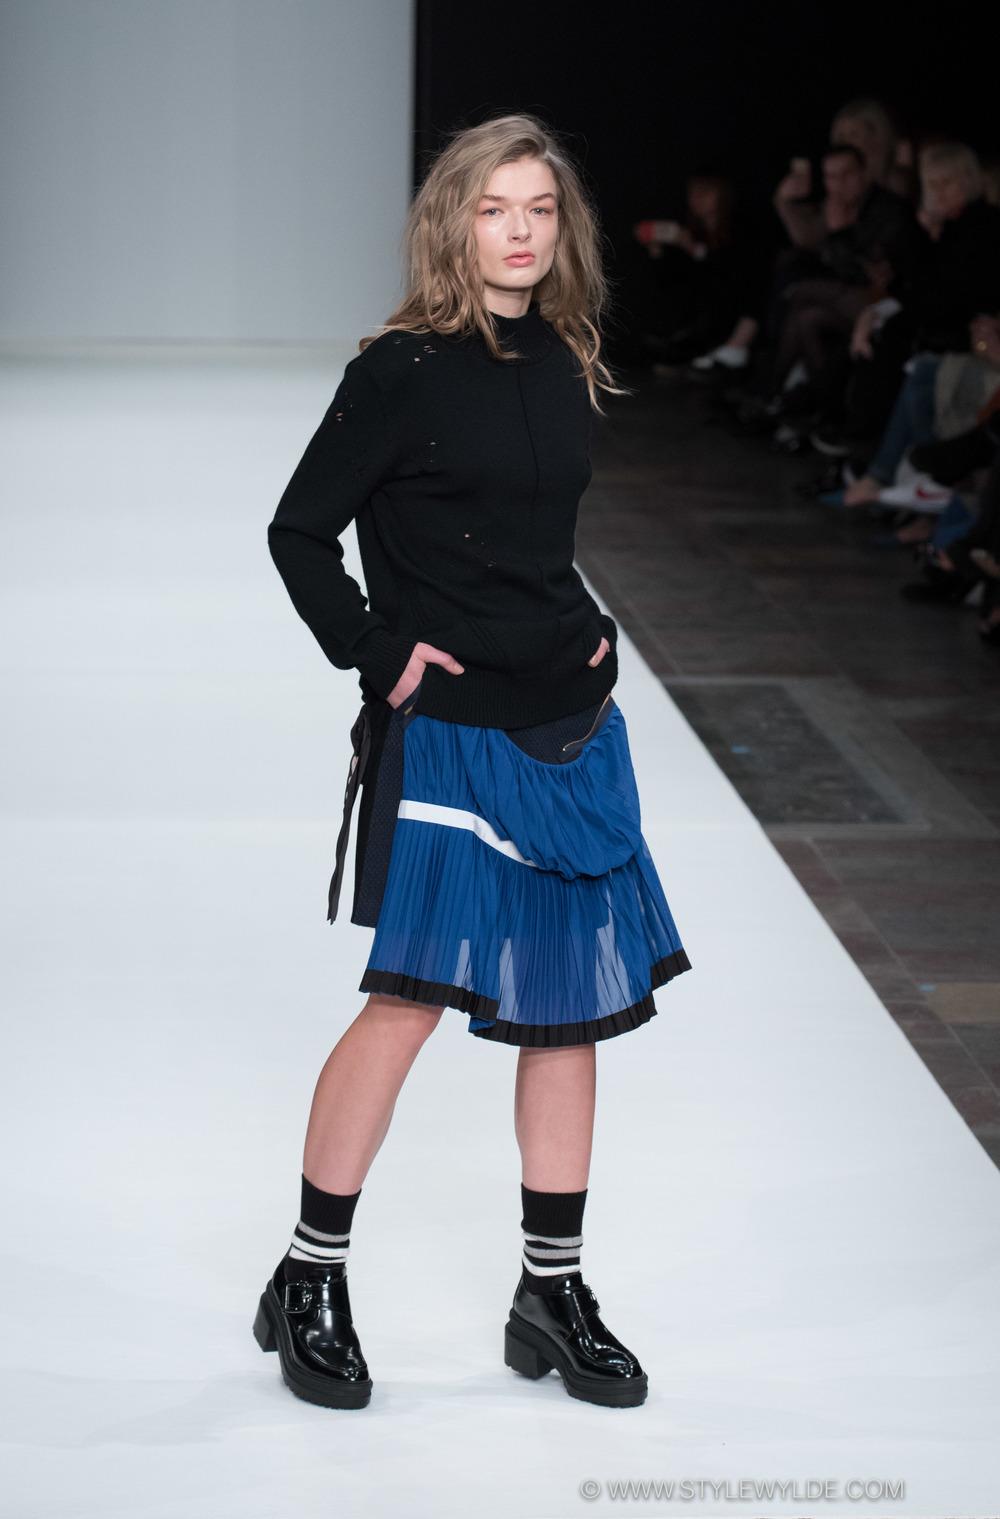 StyleWylde_Fashion Hong Kong AW16 - FOH-16.jpg